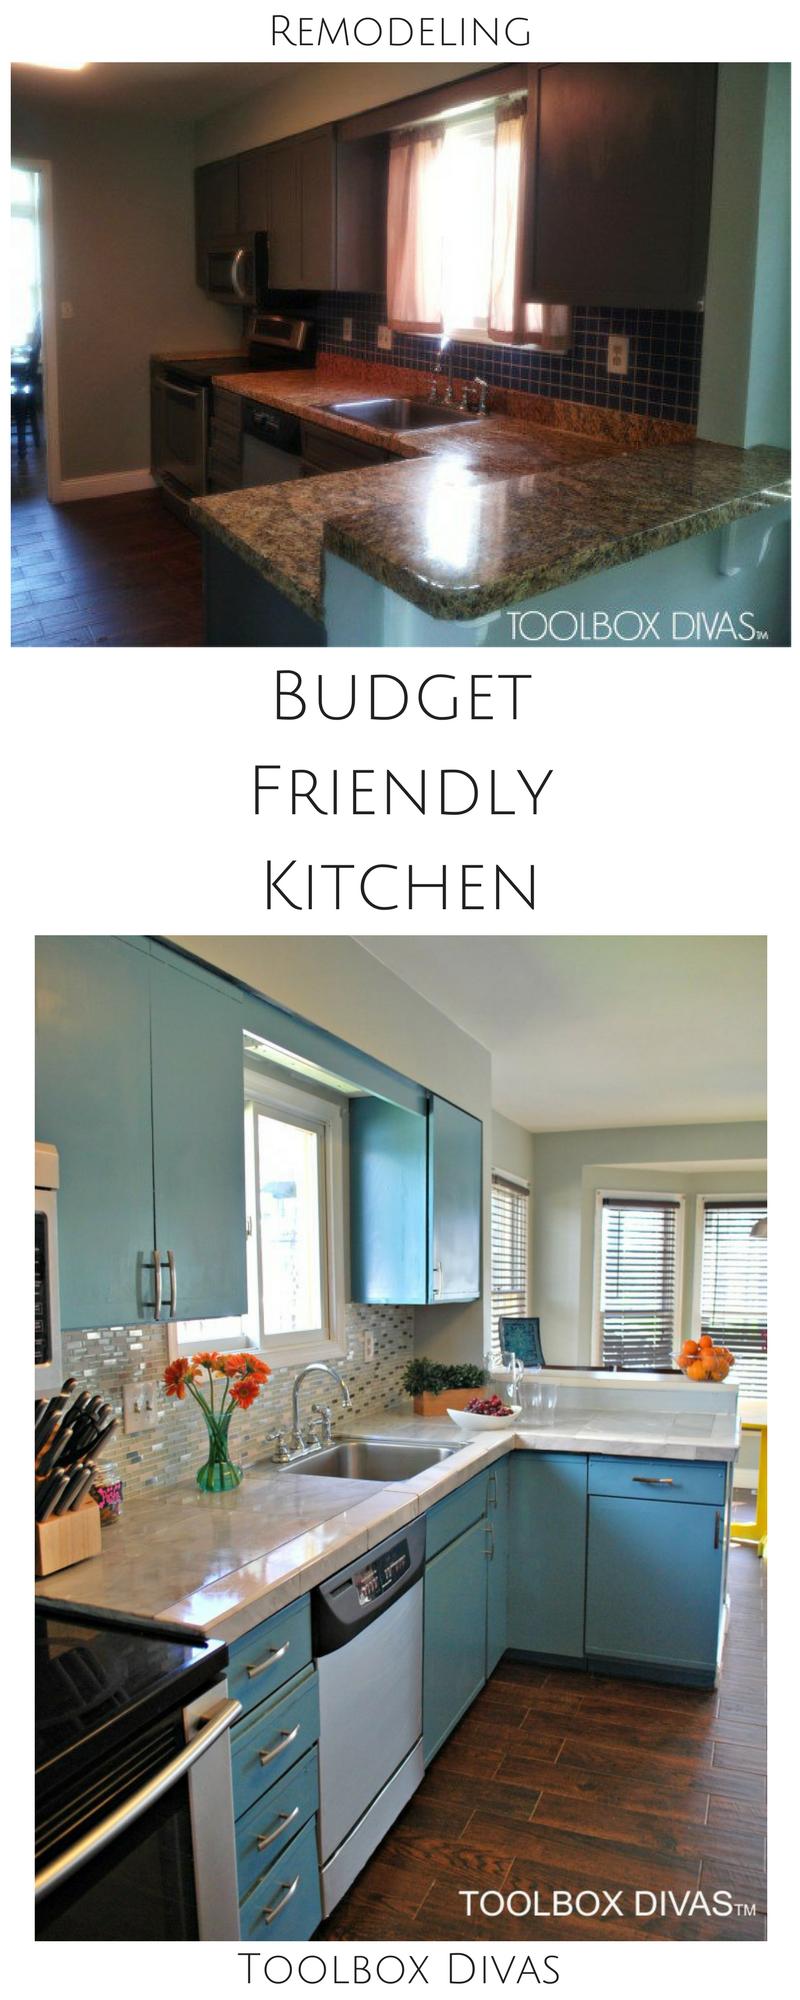 Budget Friendly Kitchen Remodel Budget Friendly Kitchen Remodel Kitchen Remodel Countertops Kitchen Remodel